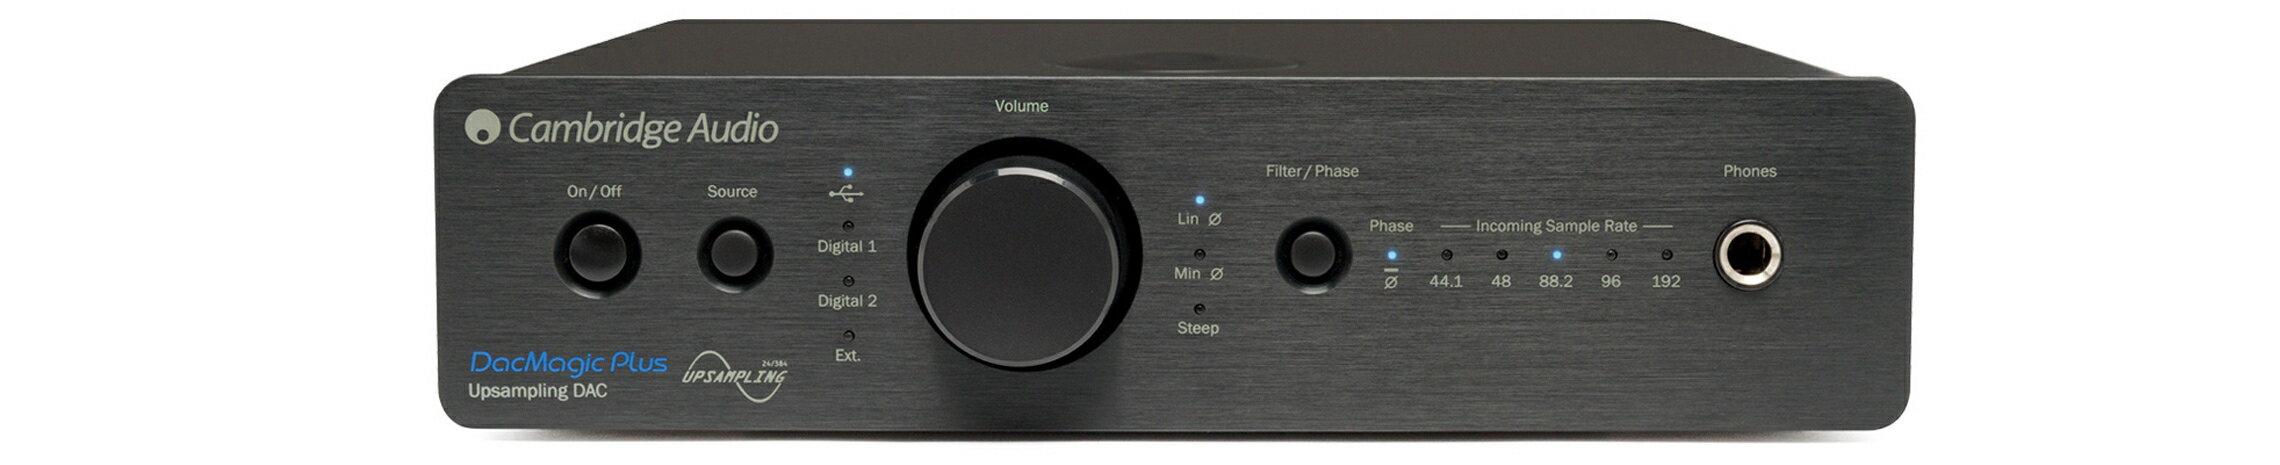 【DACMAGIC plus 數位類比轉換器】 Cambridge Audio 英國劍橋音響 家庭劇院 CD BD AV 擴大機 無線數位串流 藍芽 網路收音機